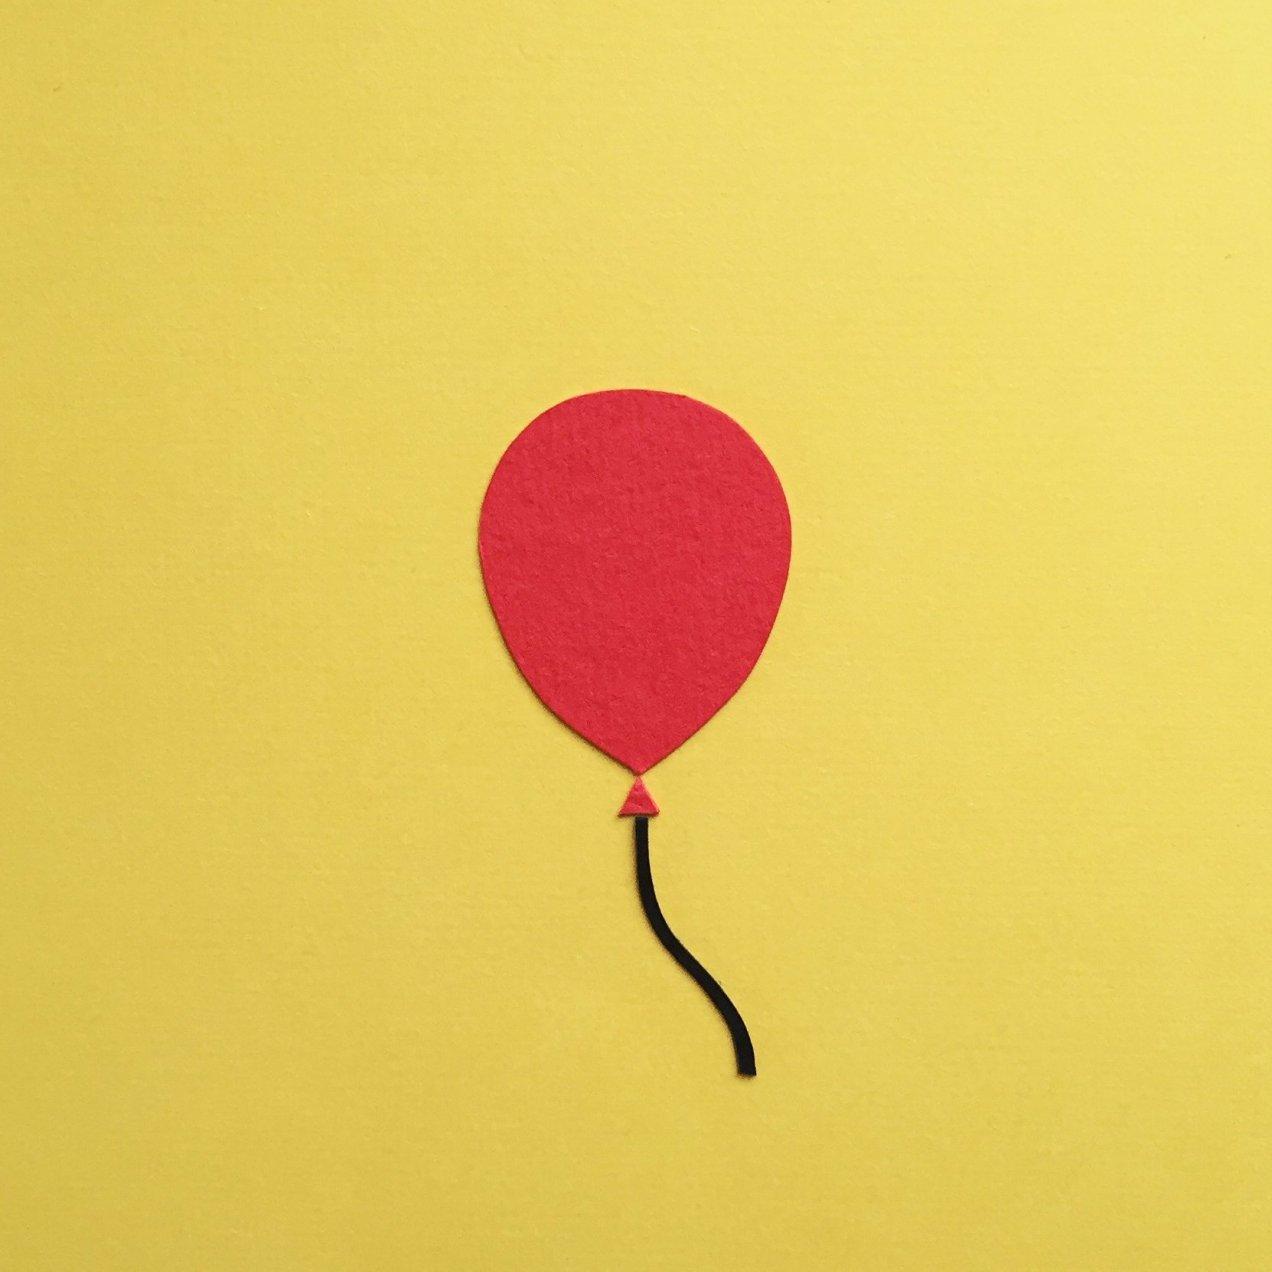 Paper emoji - balloon